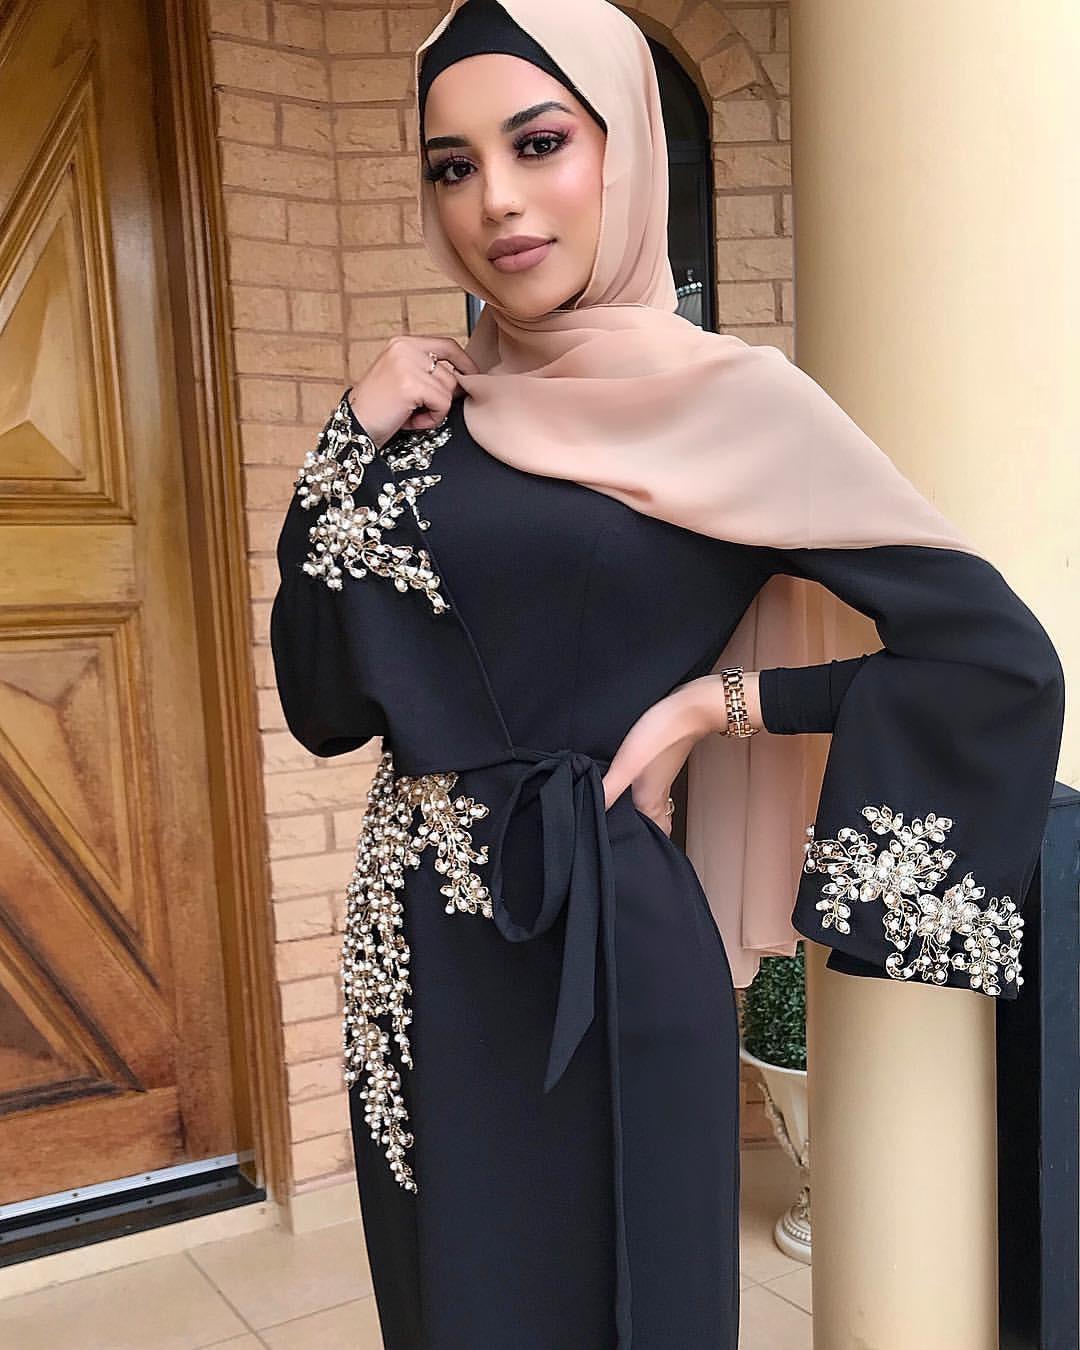 Robe femme Khoshtib la nouvelle Robe moyen-orient broderie musulmane longue Robe grande taille Maxi Robe Omighty